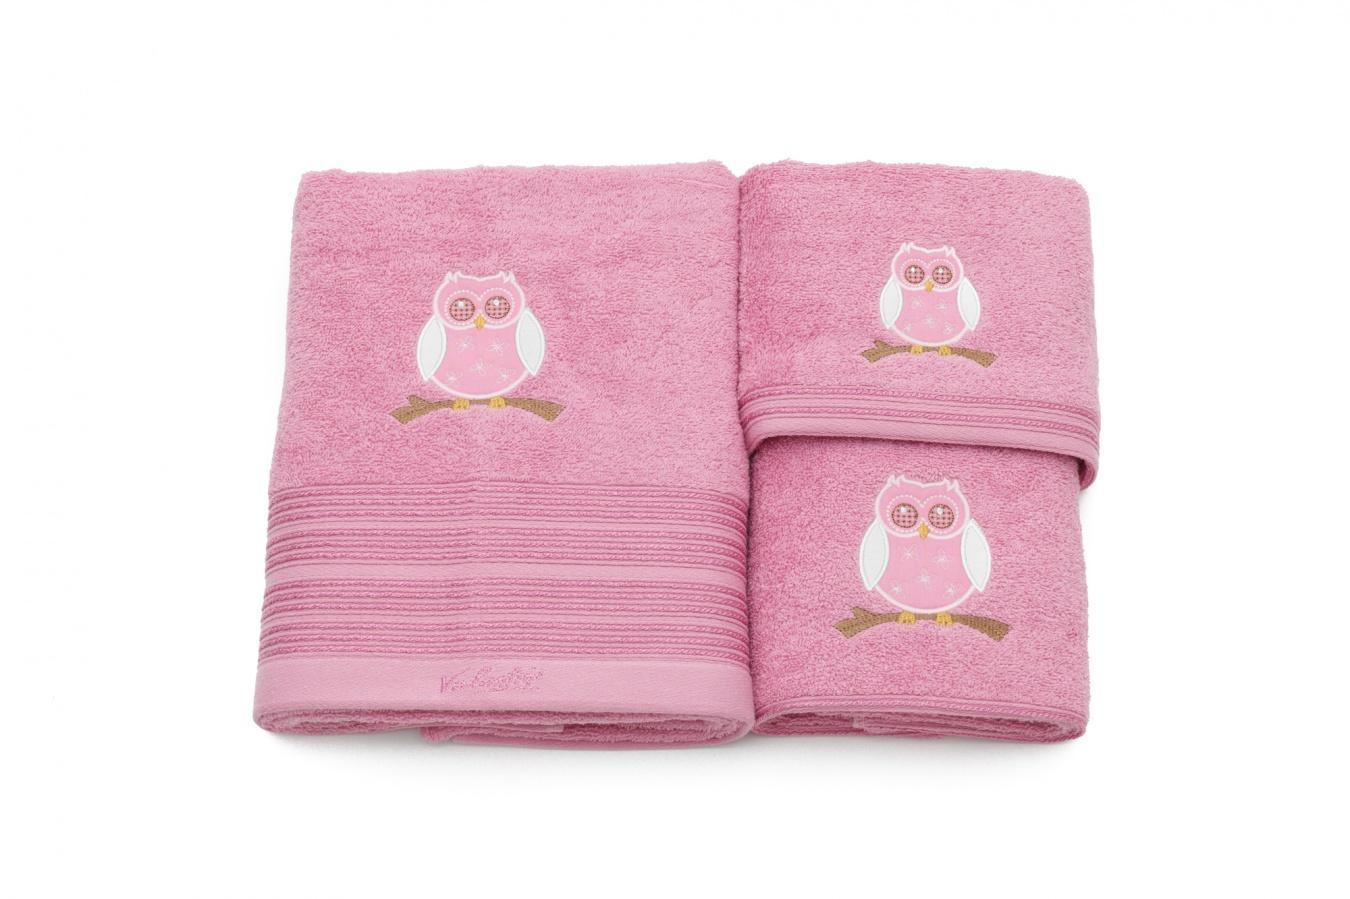 Set De 3 Prosoape Pentru Copii Valentini Bianco Roz Tbr06c-2131 Owl